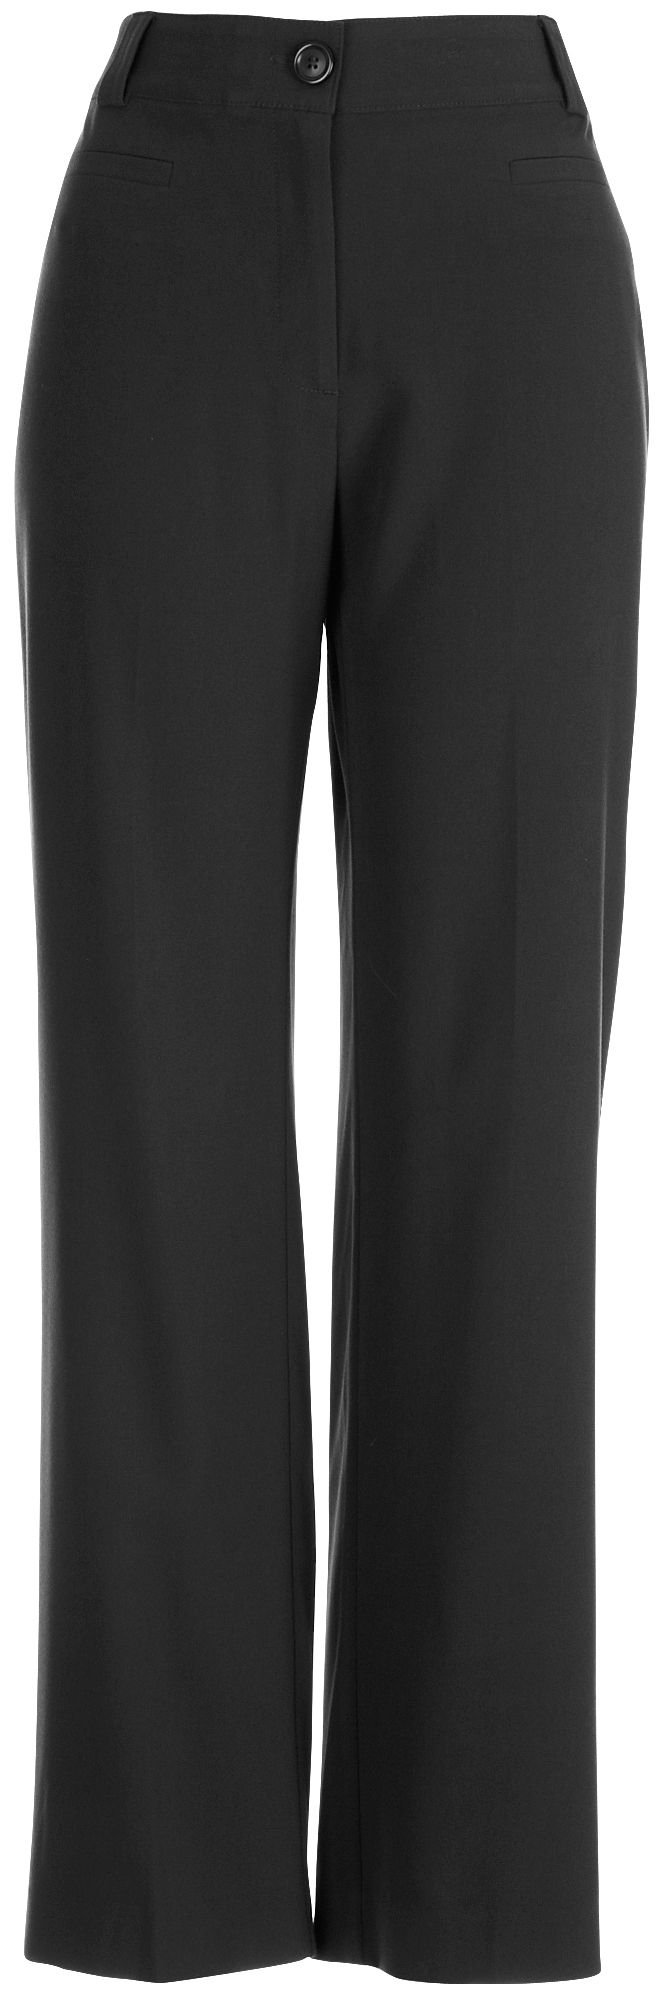 Counterparts Womens Bi-Stretch No Gap Pants 14 Black